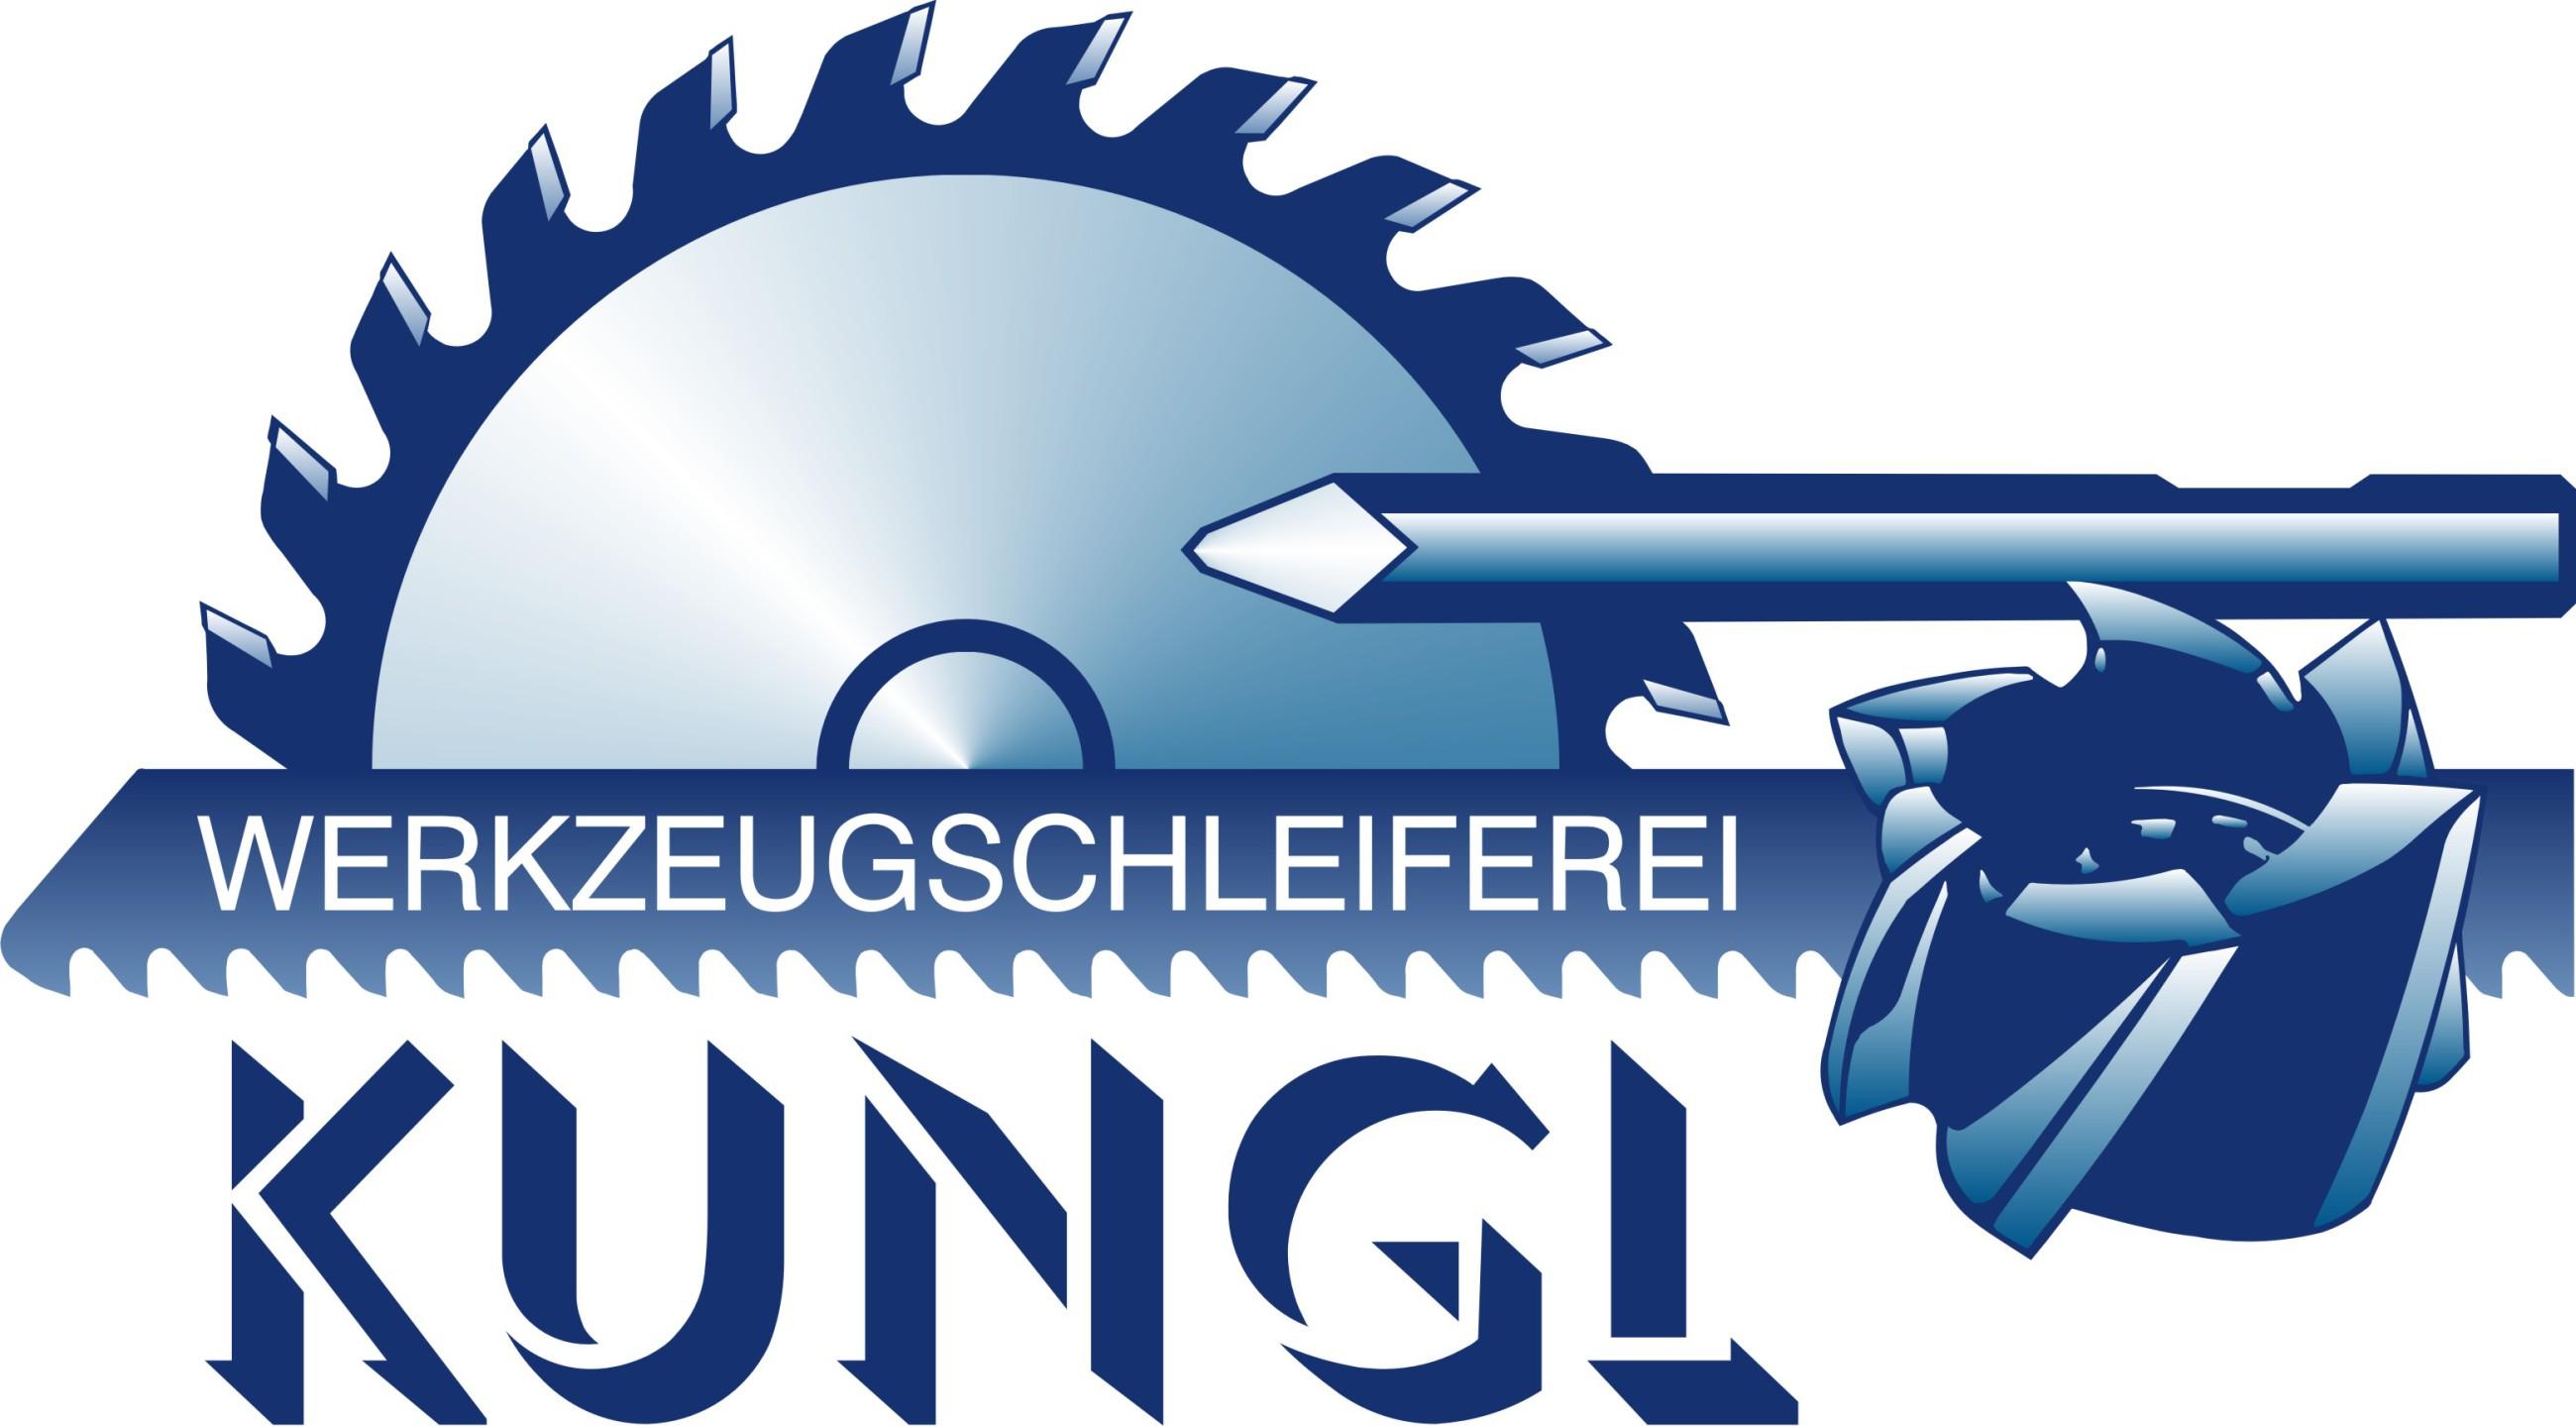 Firmenlogo Peter Kungl (Werkzeugschleiferei Kungl)